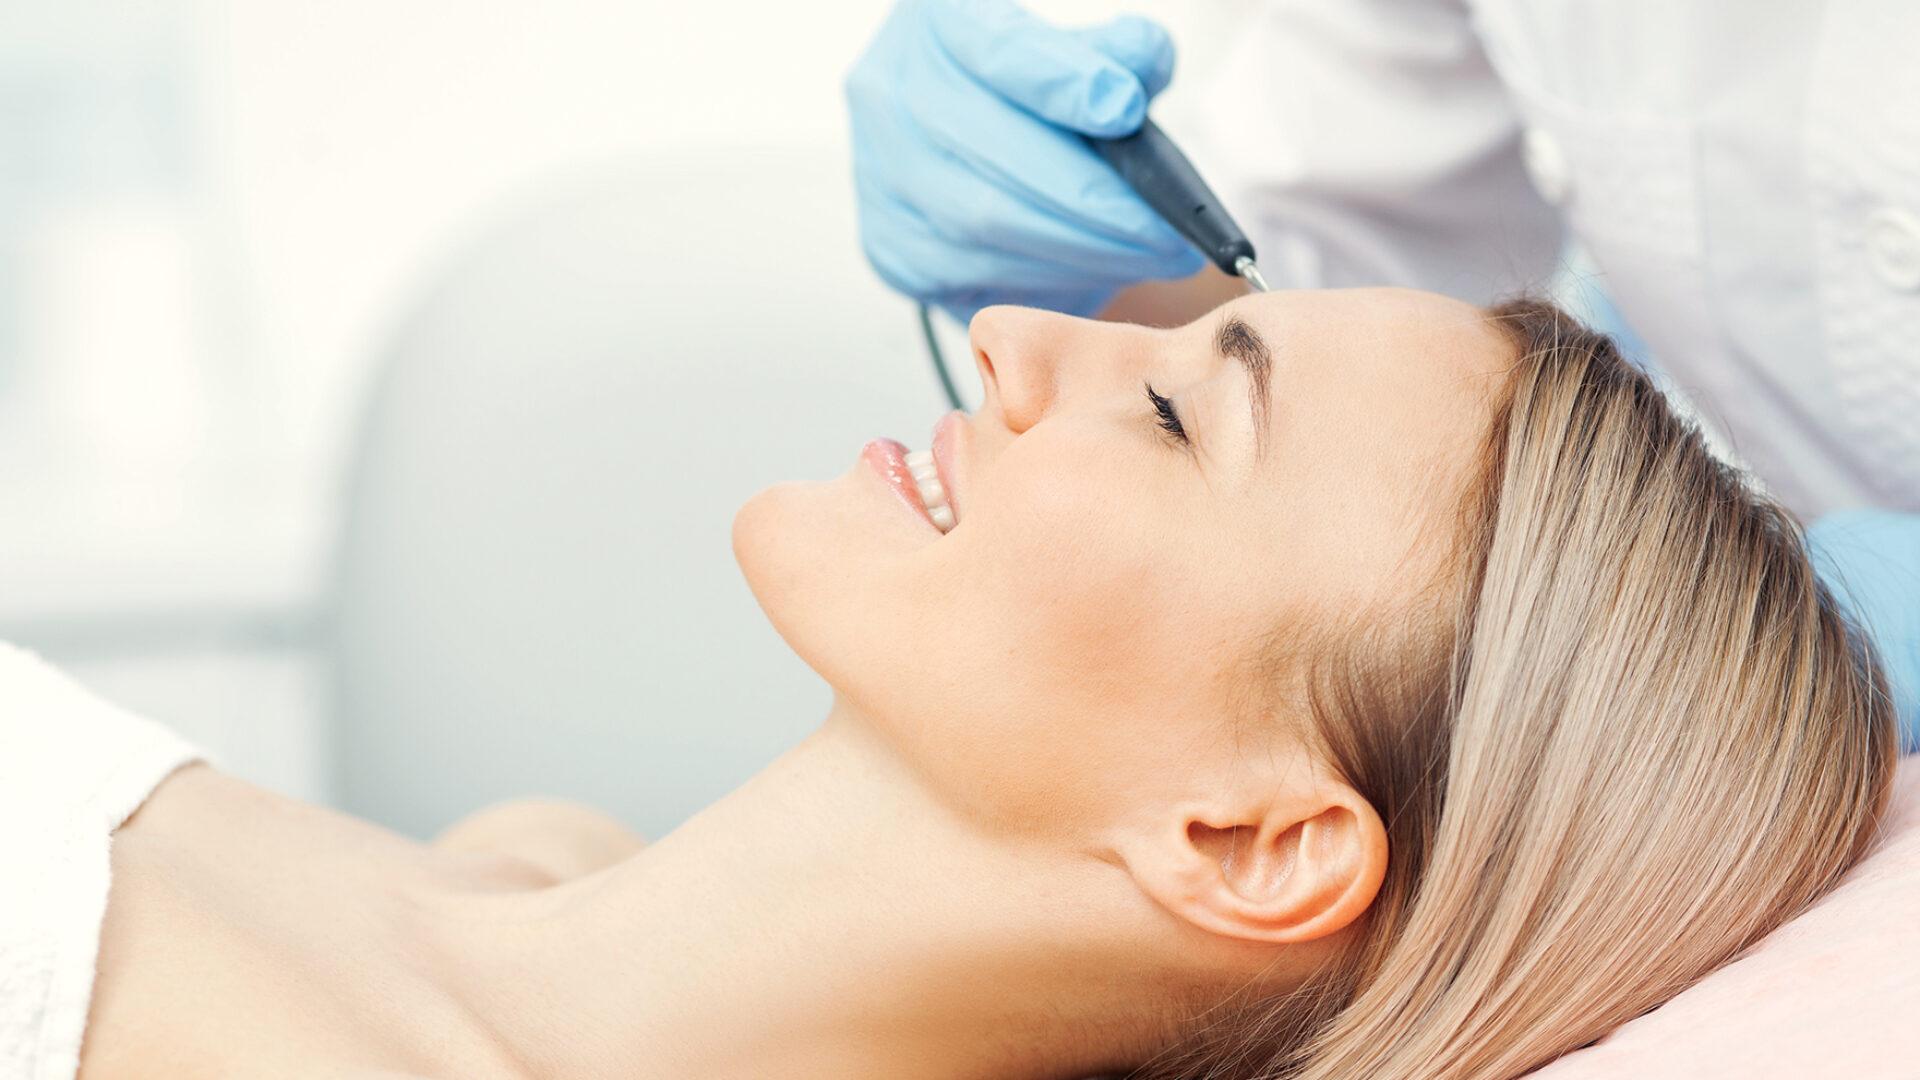 Behandlung zur Hautverjüngung.